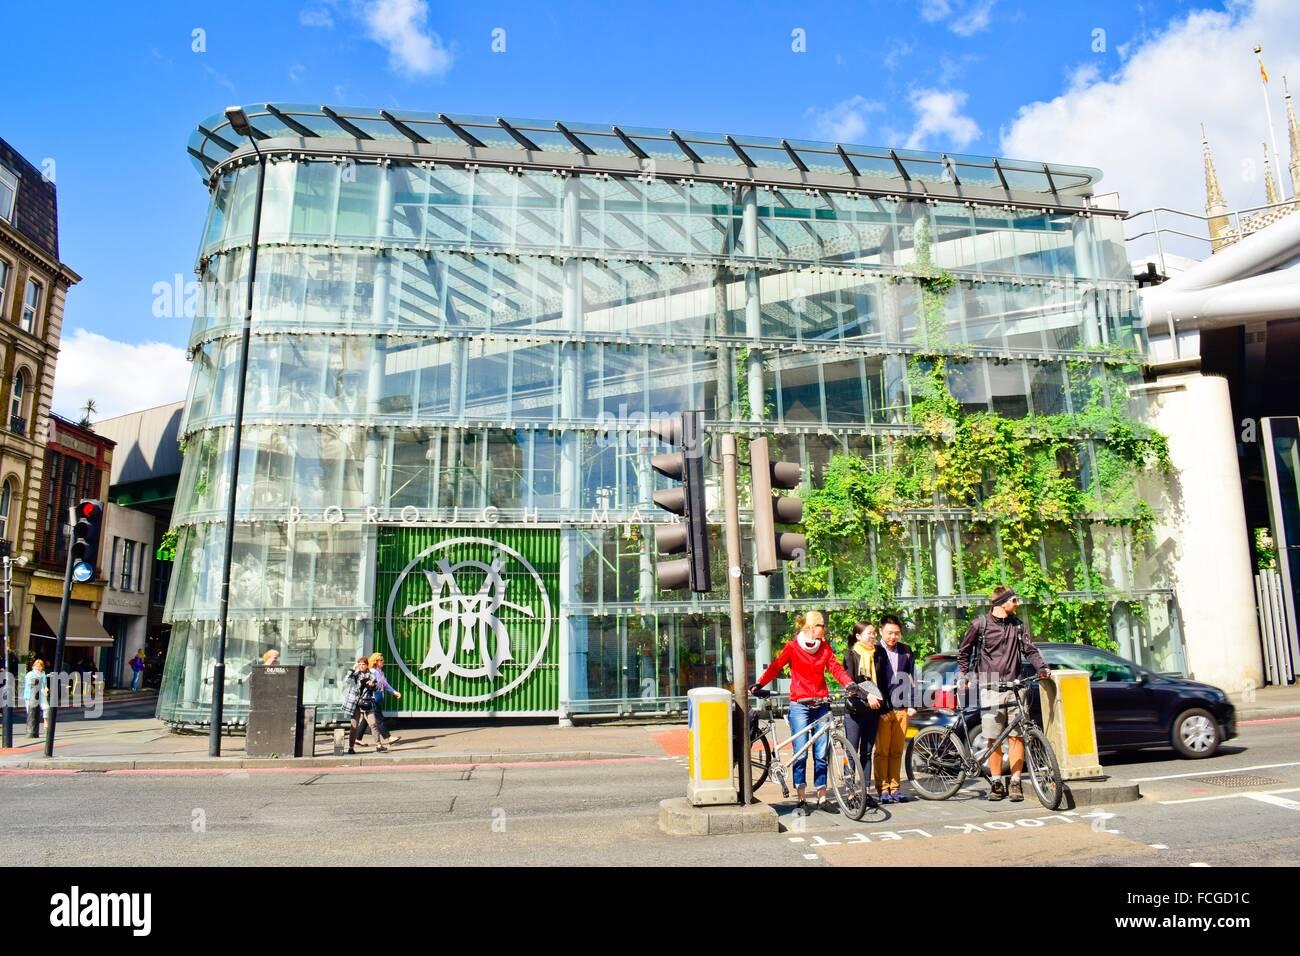 Borough Market facade, people waiting at a stoplight. London, England, United Kingdom. - Stock Image